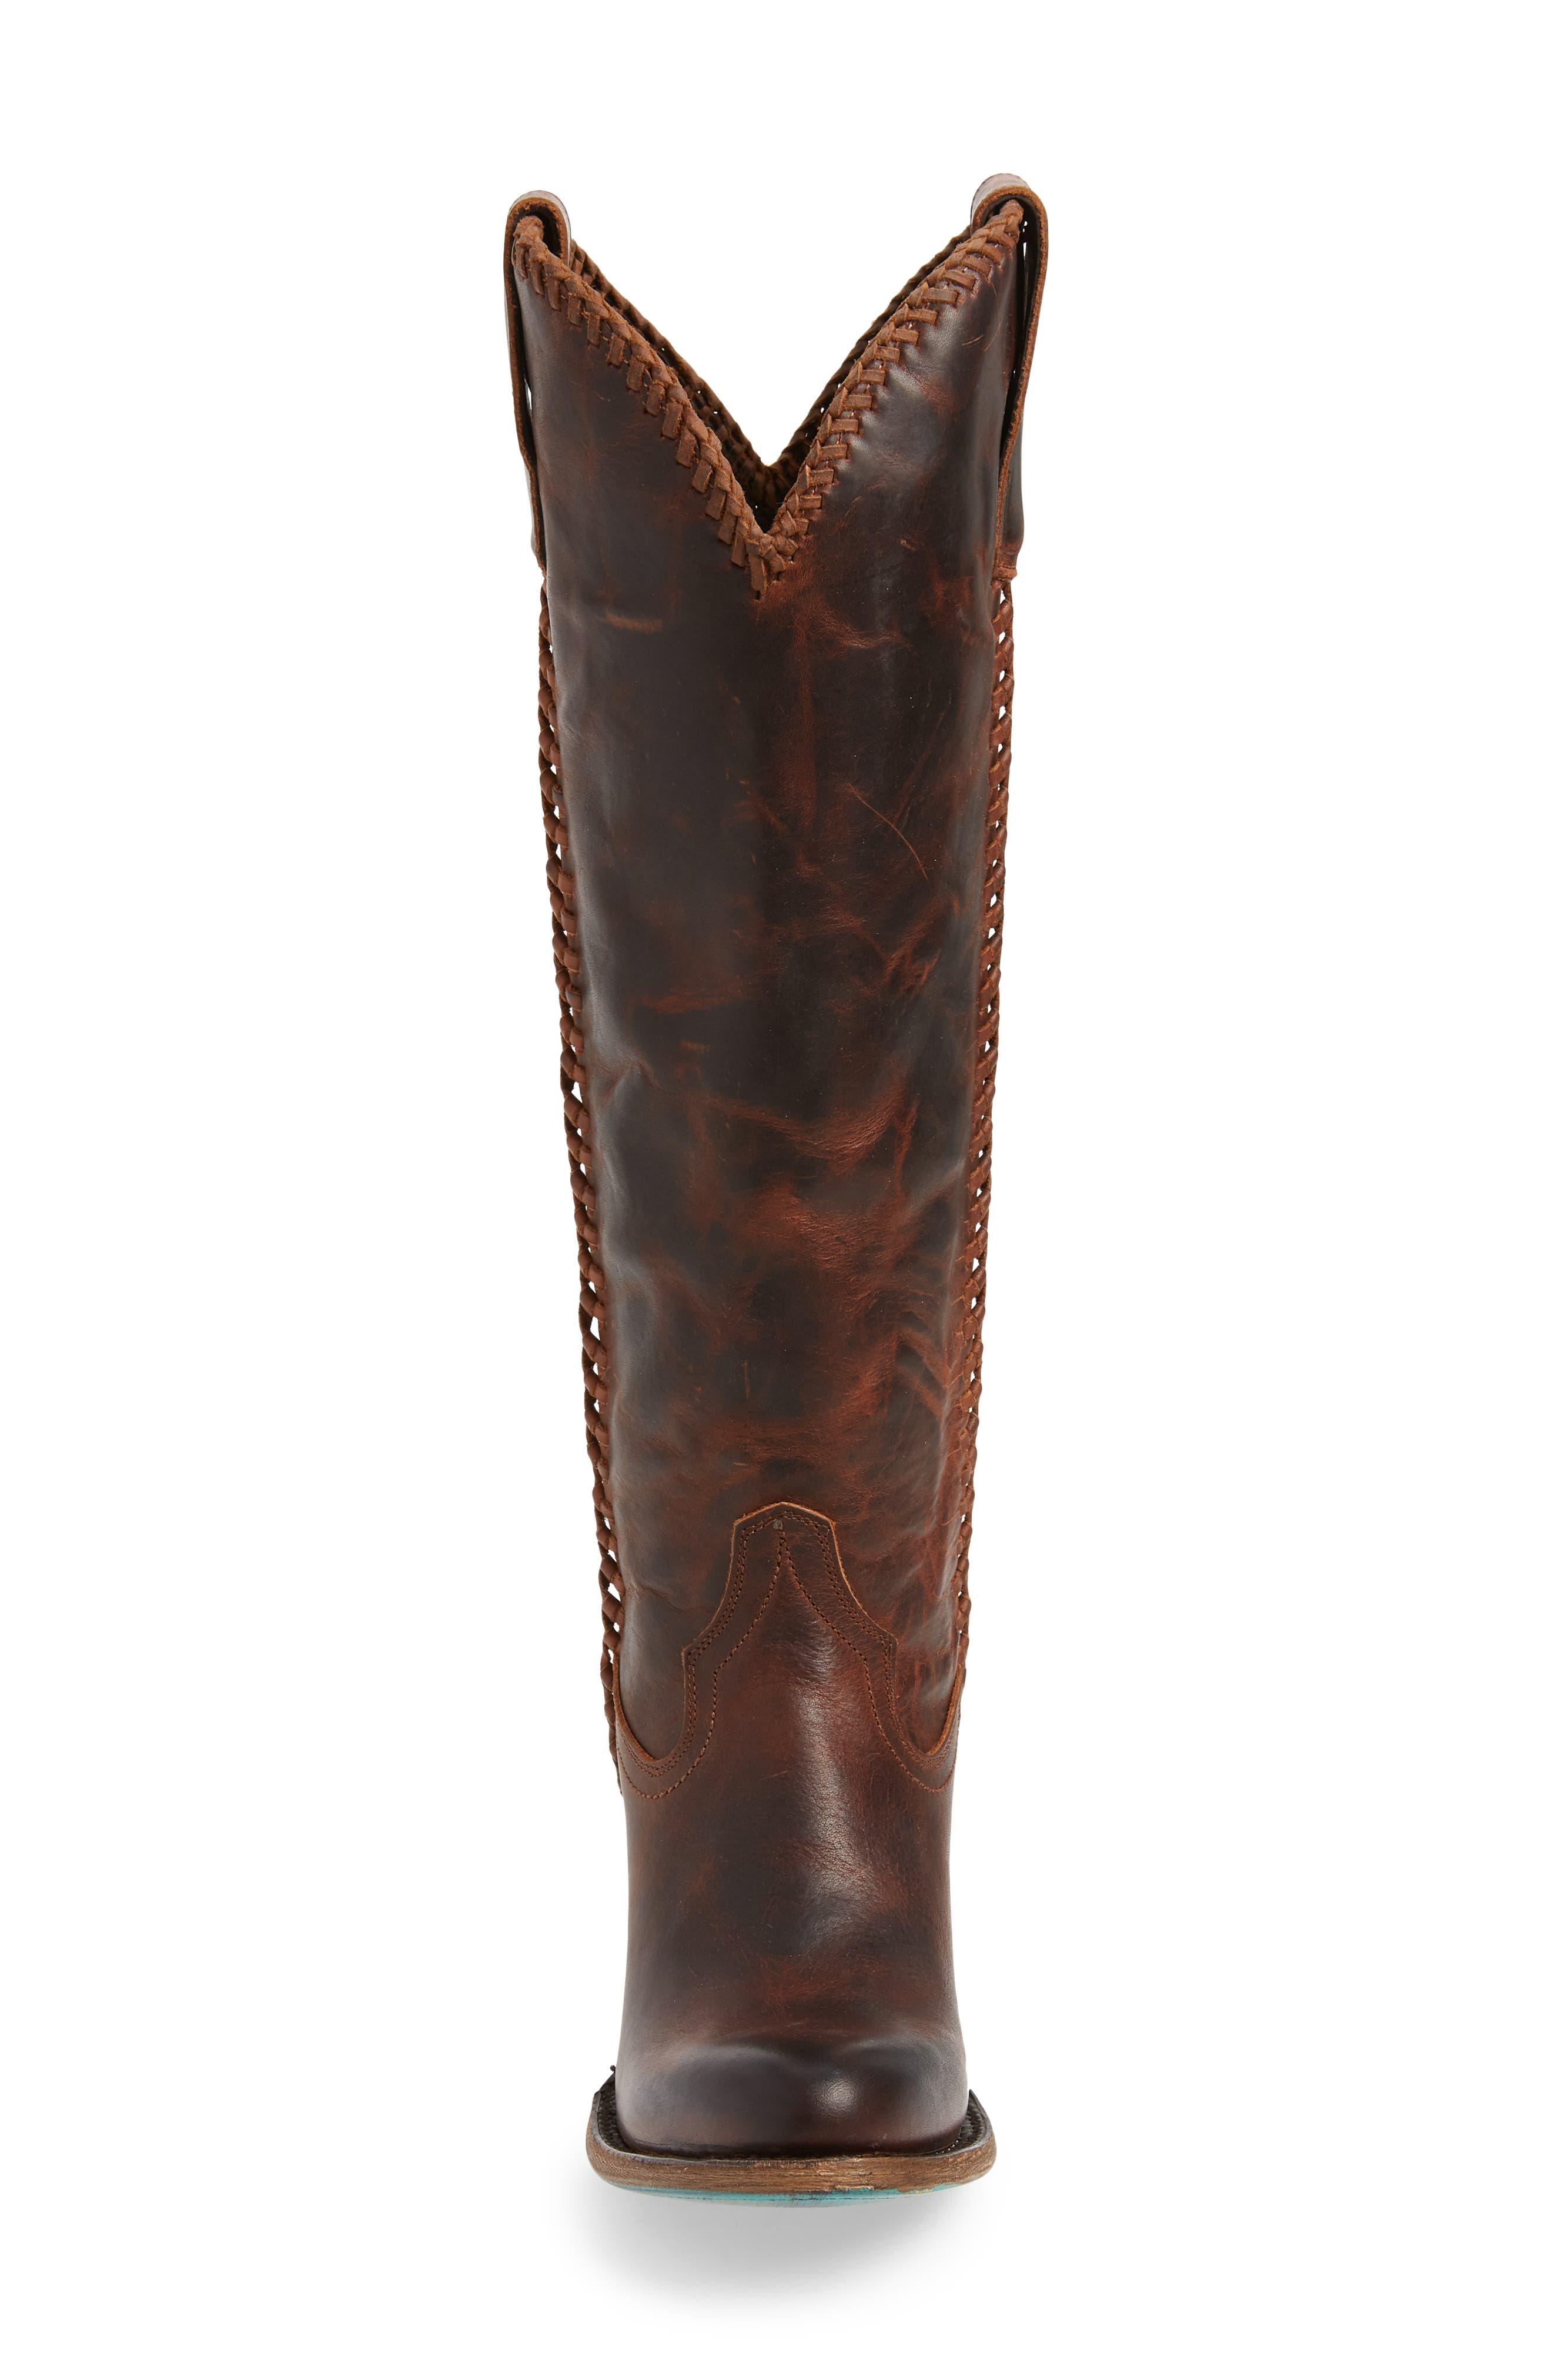 LANE BOOTS,                             Plain Jane Knee High Western Boot,                             Alternate thumbnail 4, color,                             COGNAC LEATHER